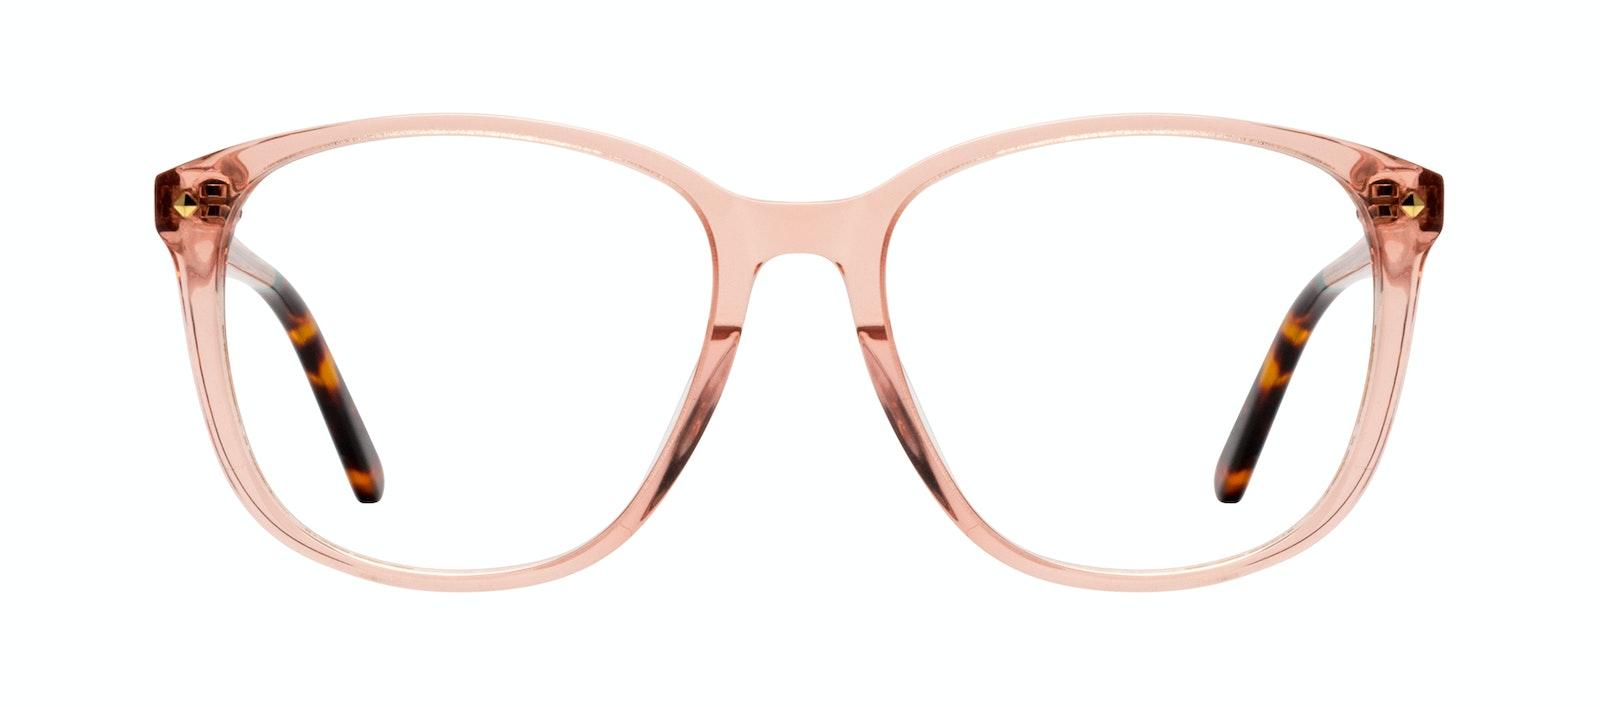 Affordable Fashion Glasses Square Eyeglasses Women Lauren Peach Front